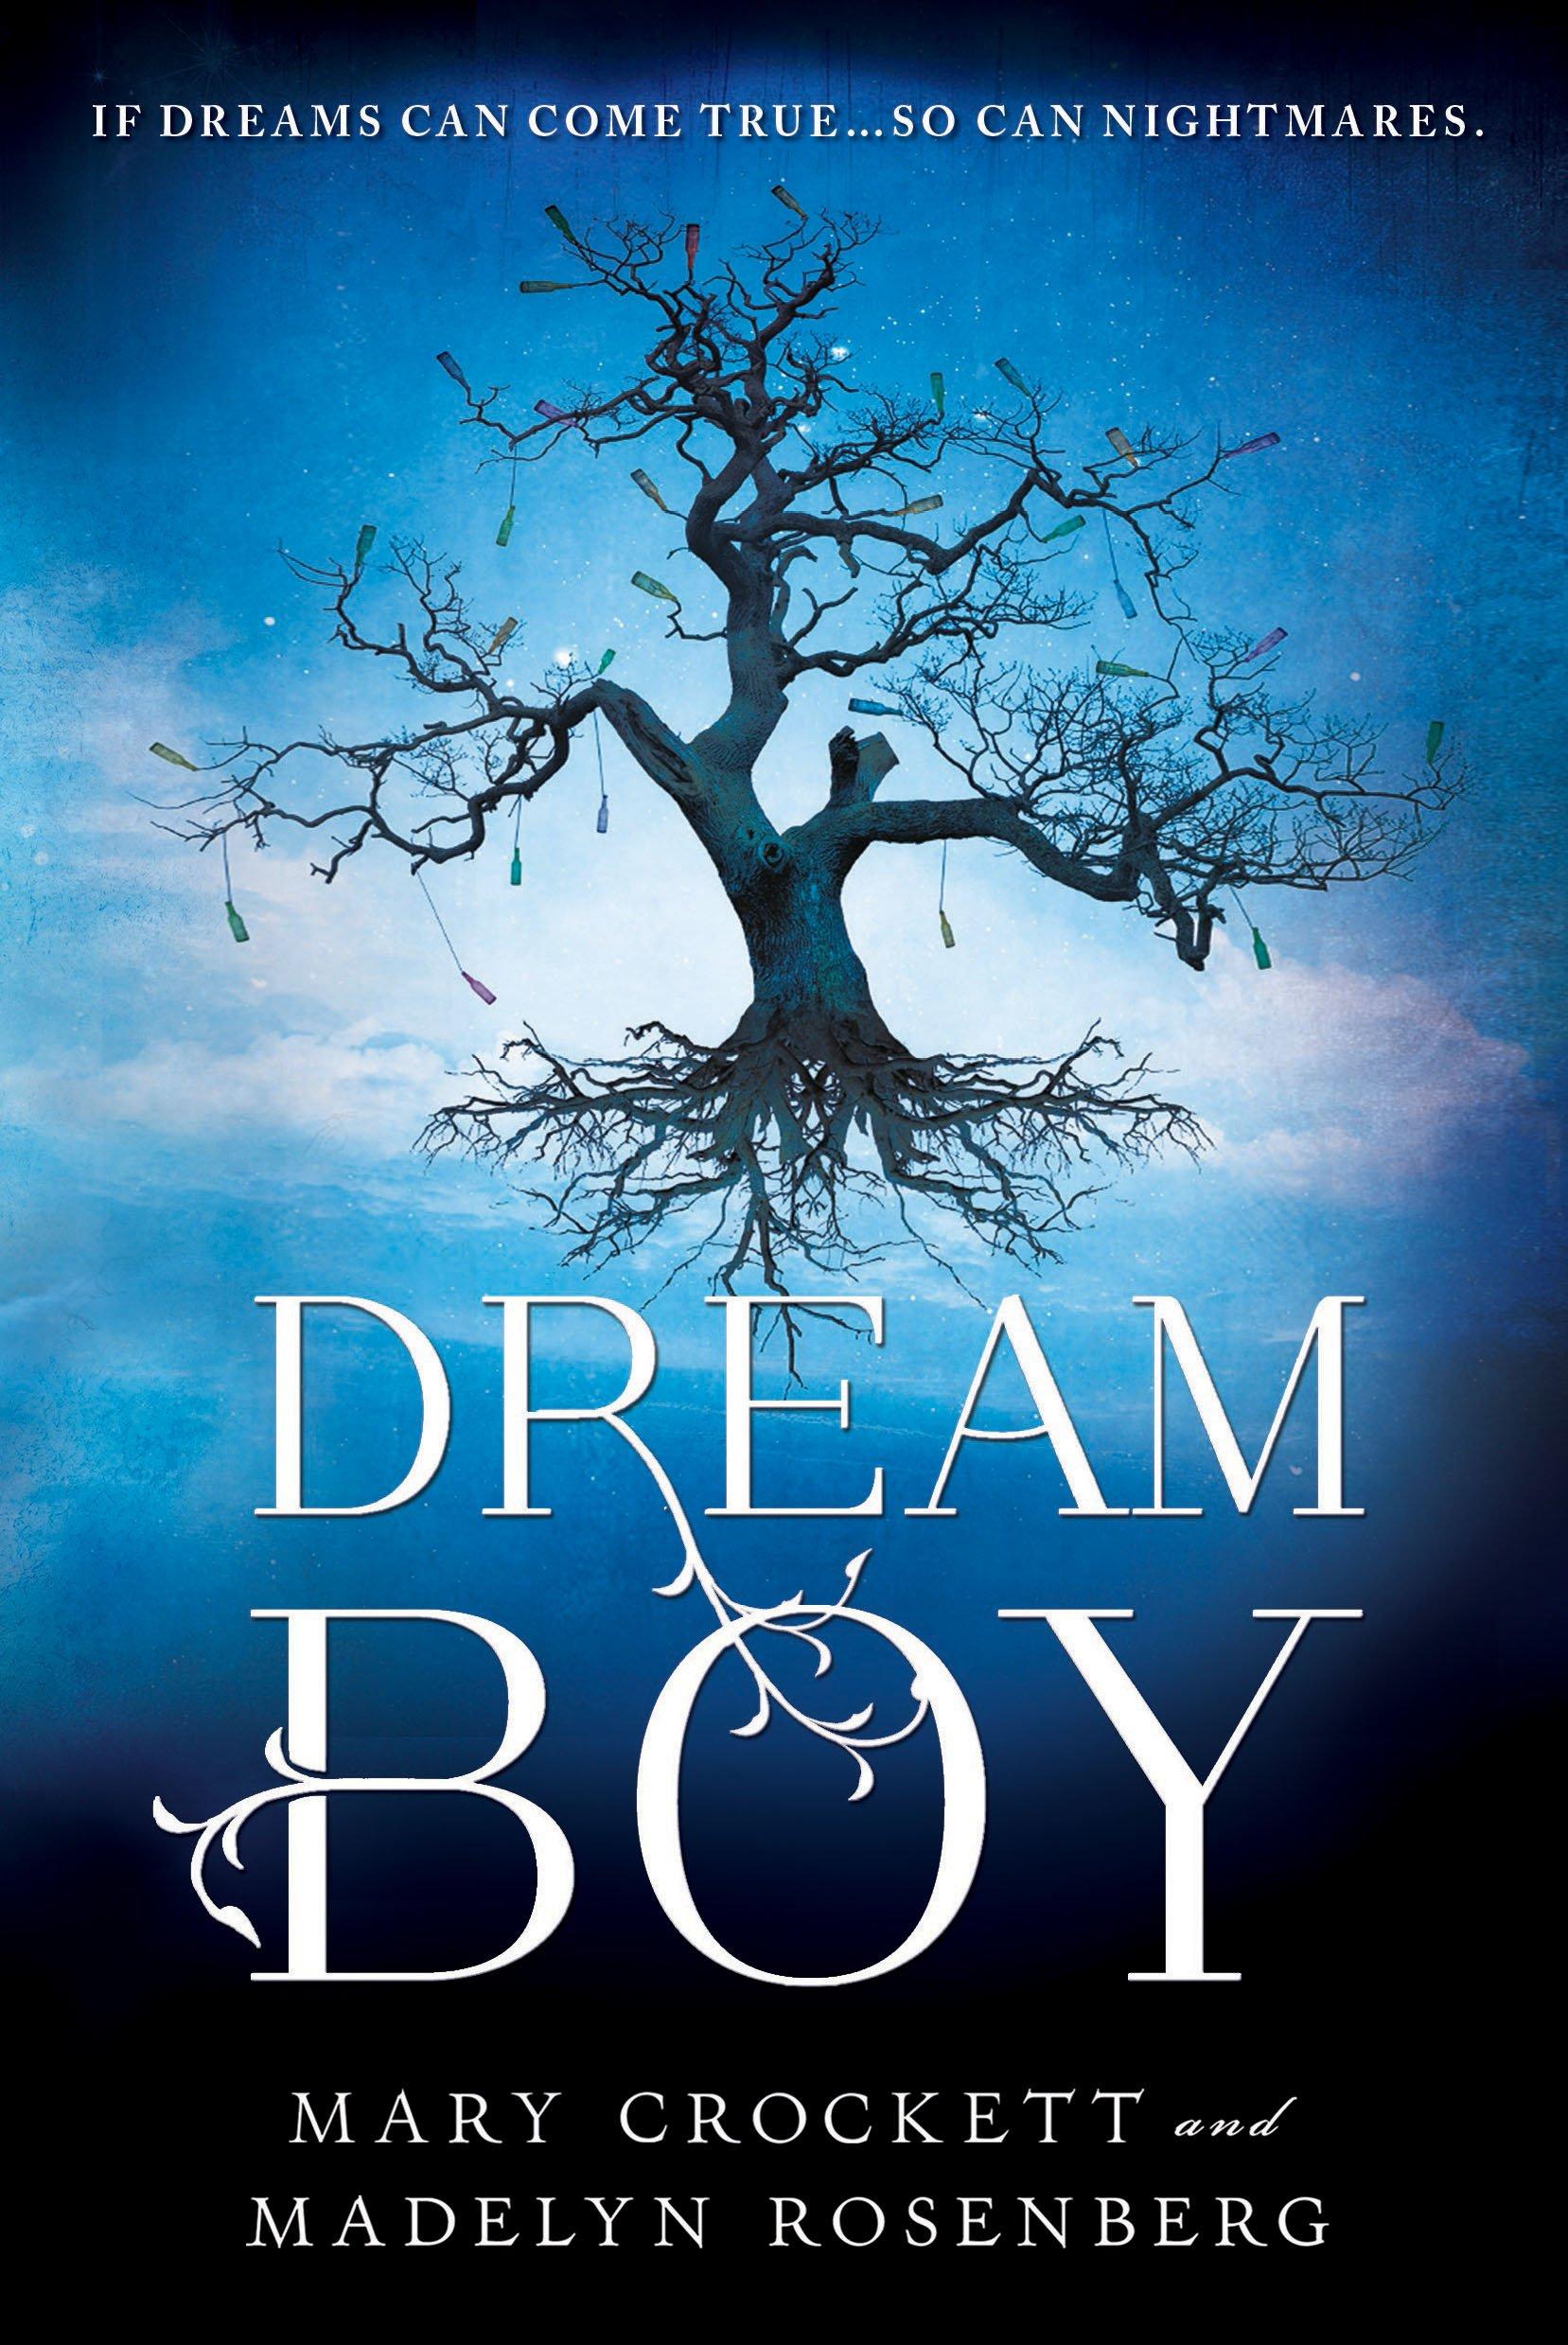 Amazon   Dream Boy   Crockett, Mary, Rosenberg, Madelyn   Fantasy ...